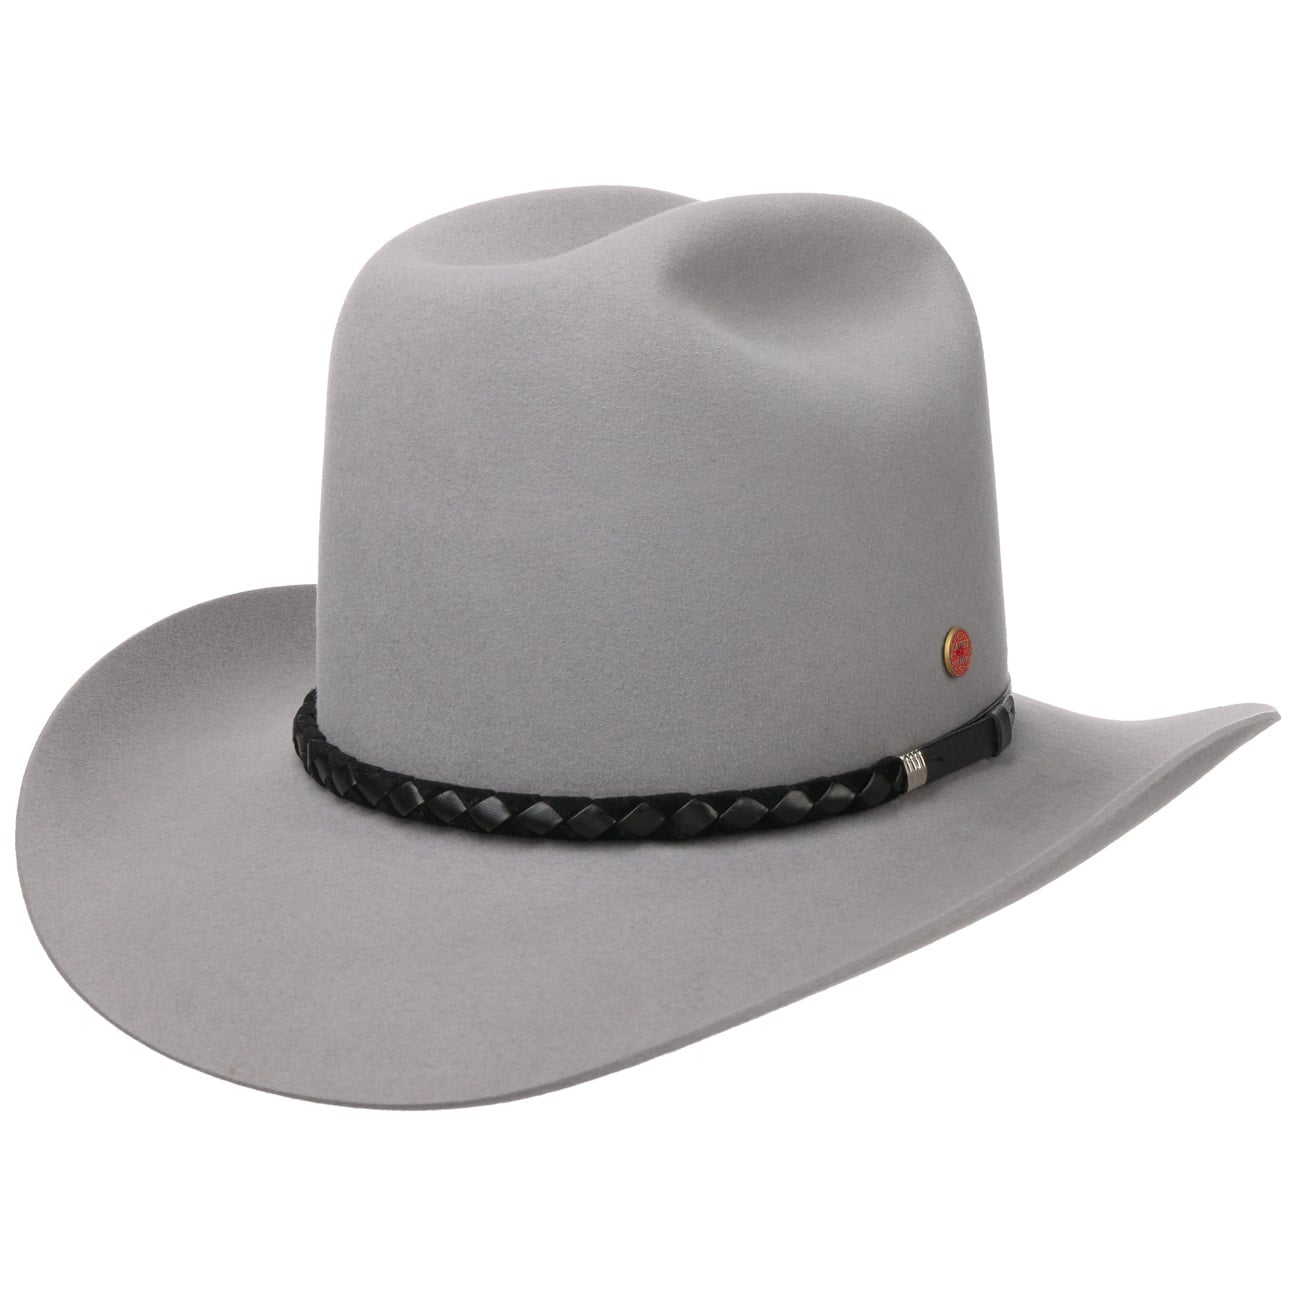 Chapeau Western Rio Rancho by Mayser  chapeau de rodéo